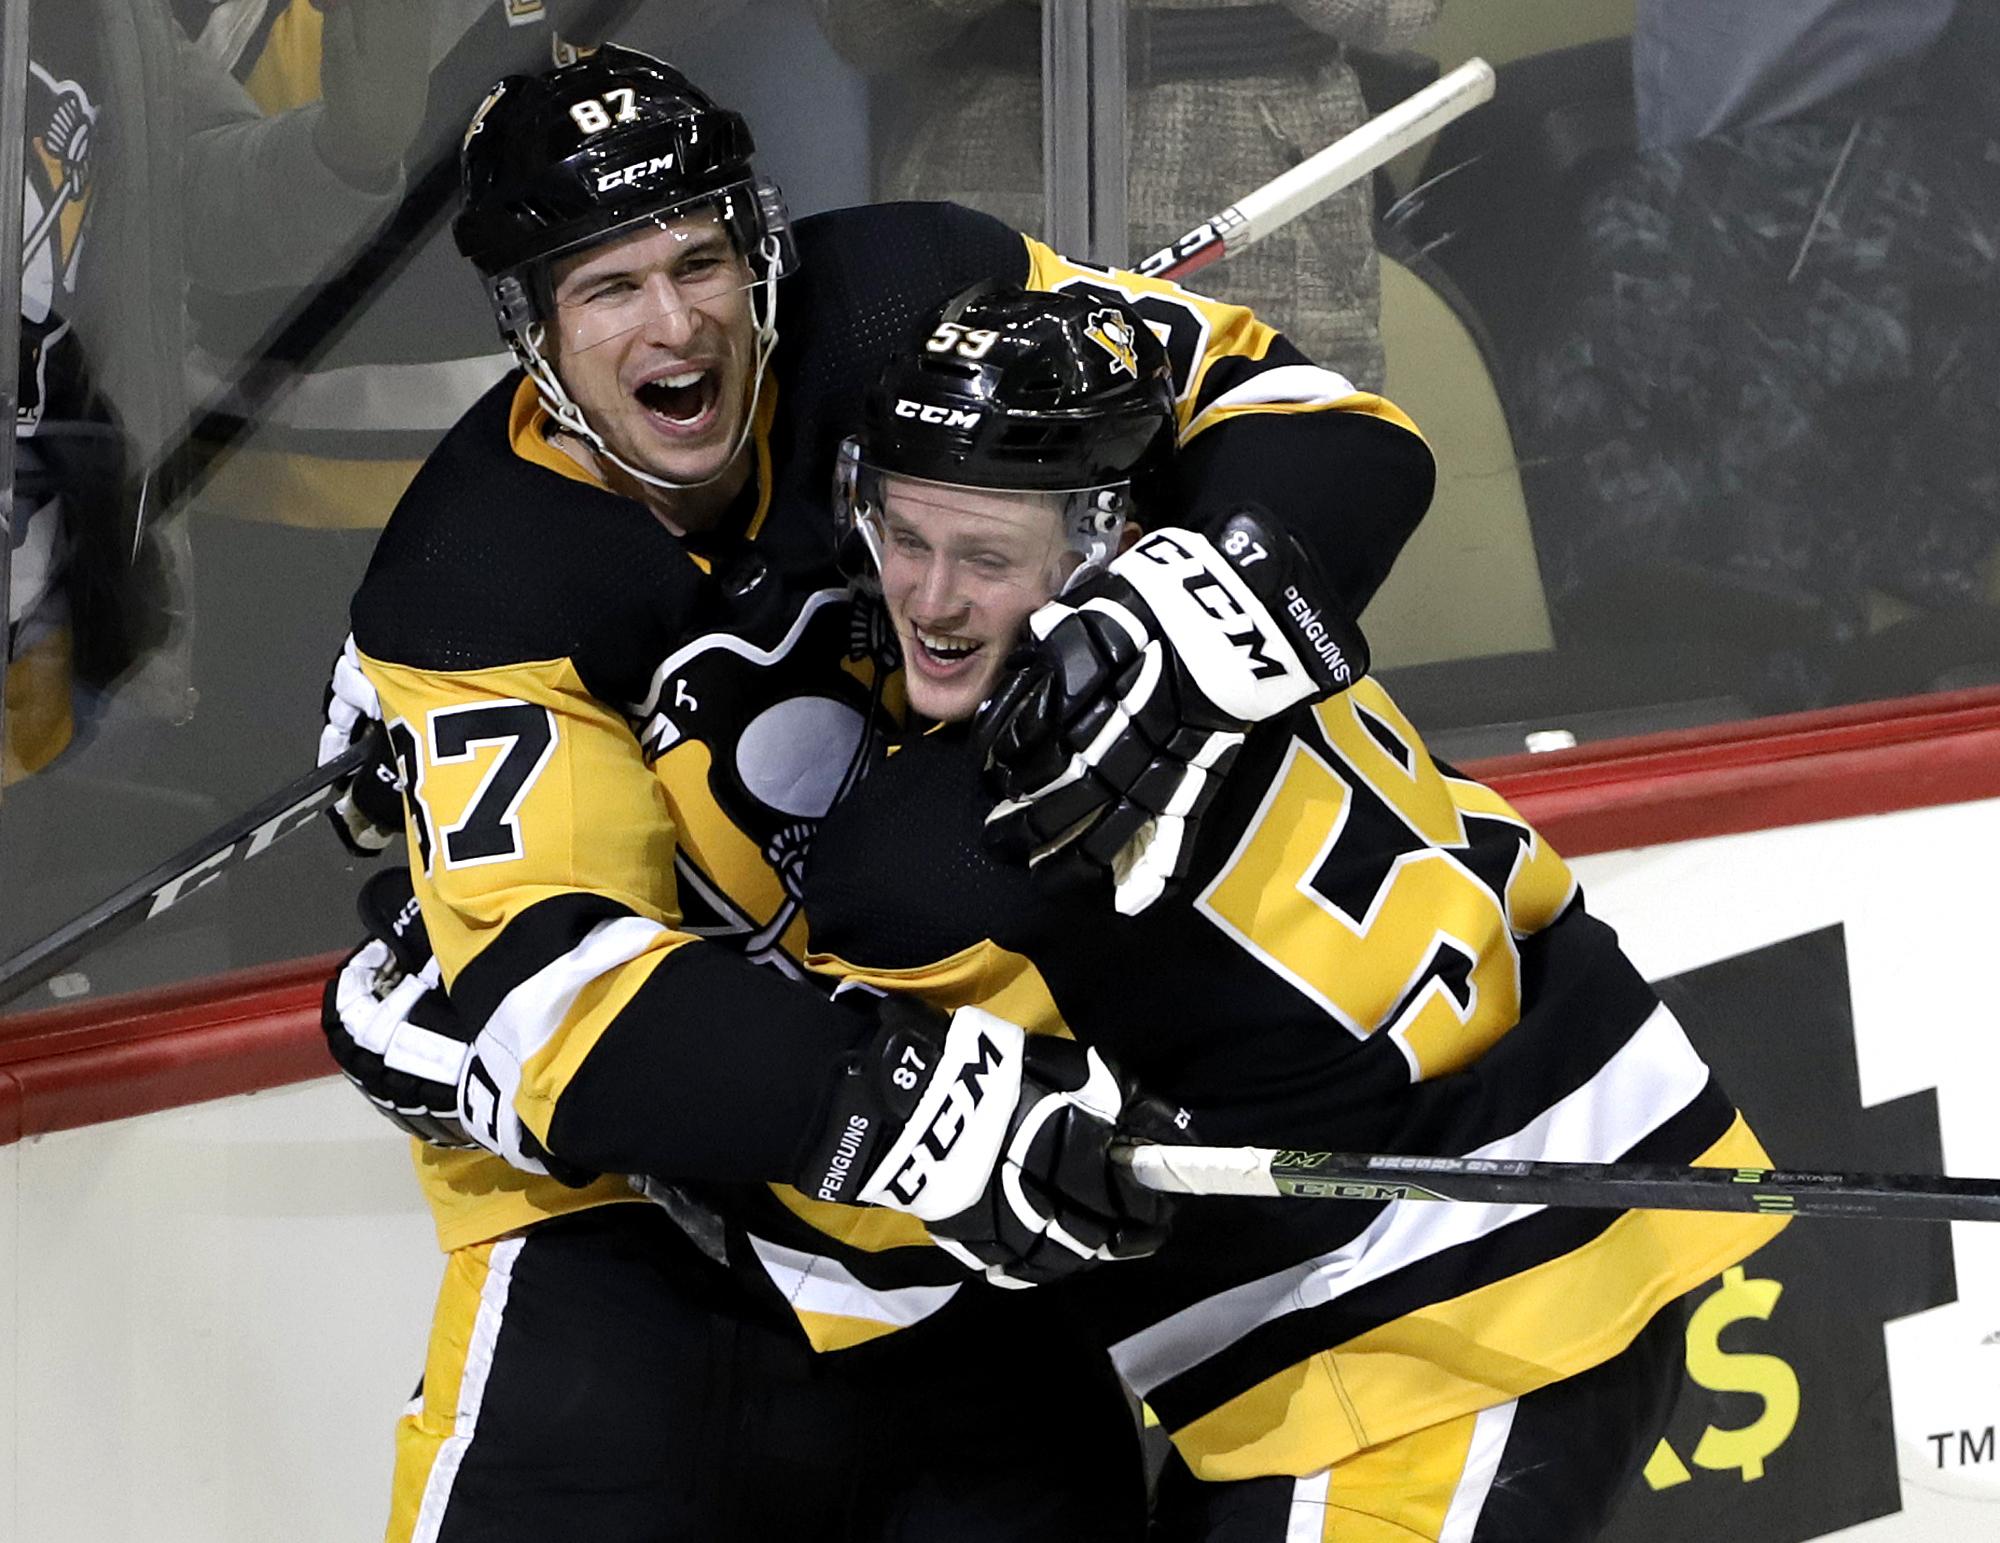 Guentzel's OT winner lifts Penguins over Panthers 3-2